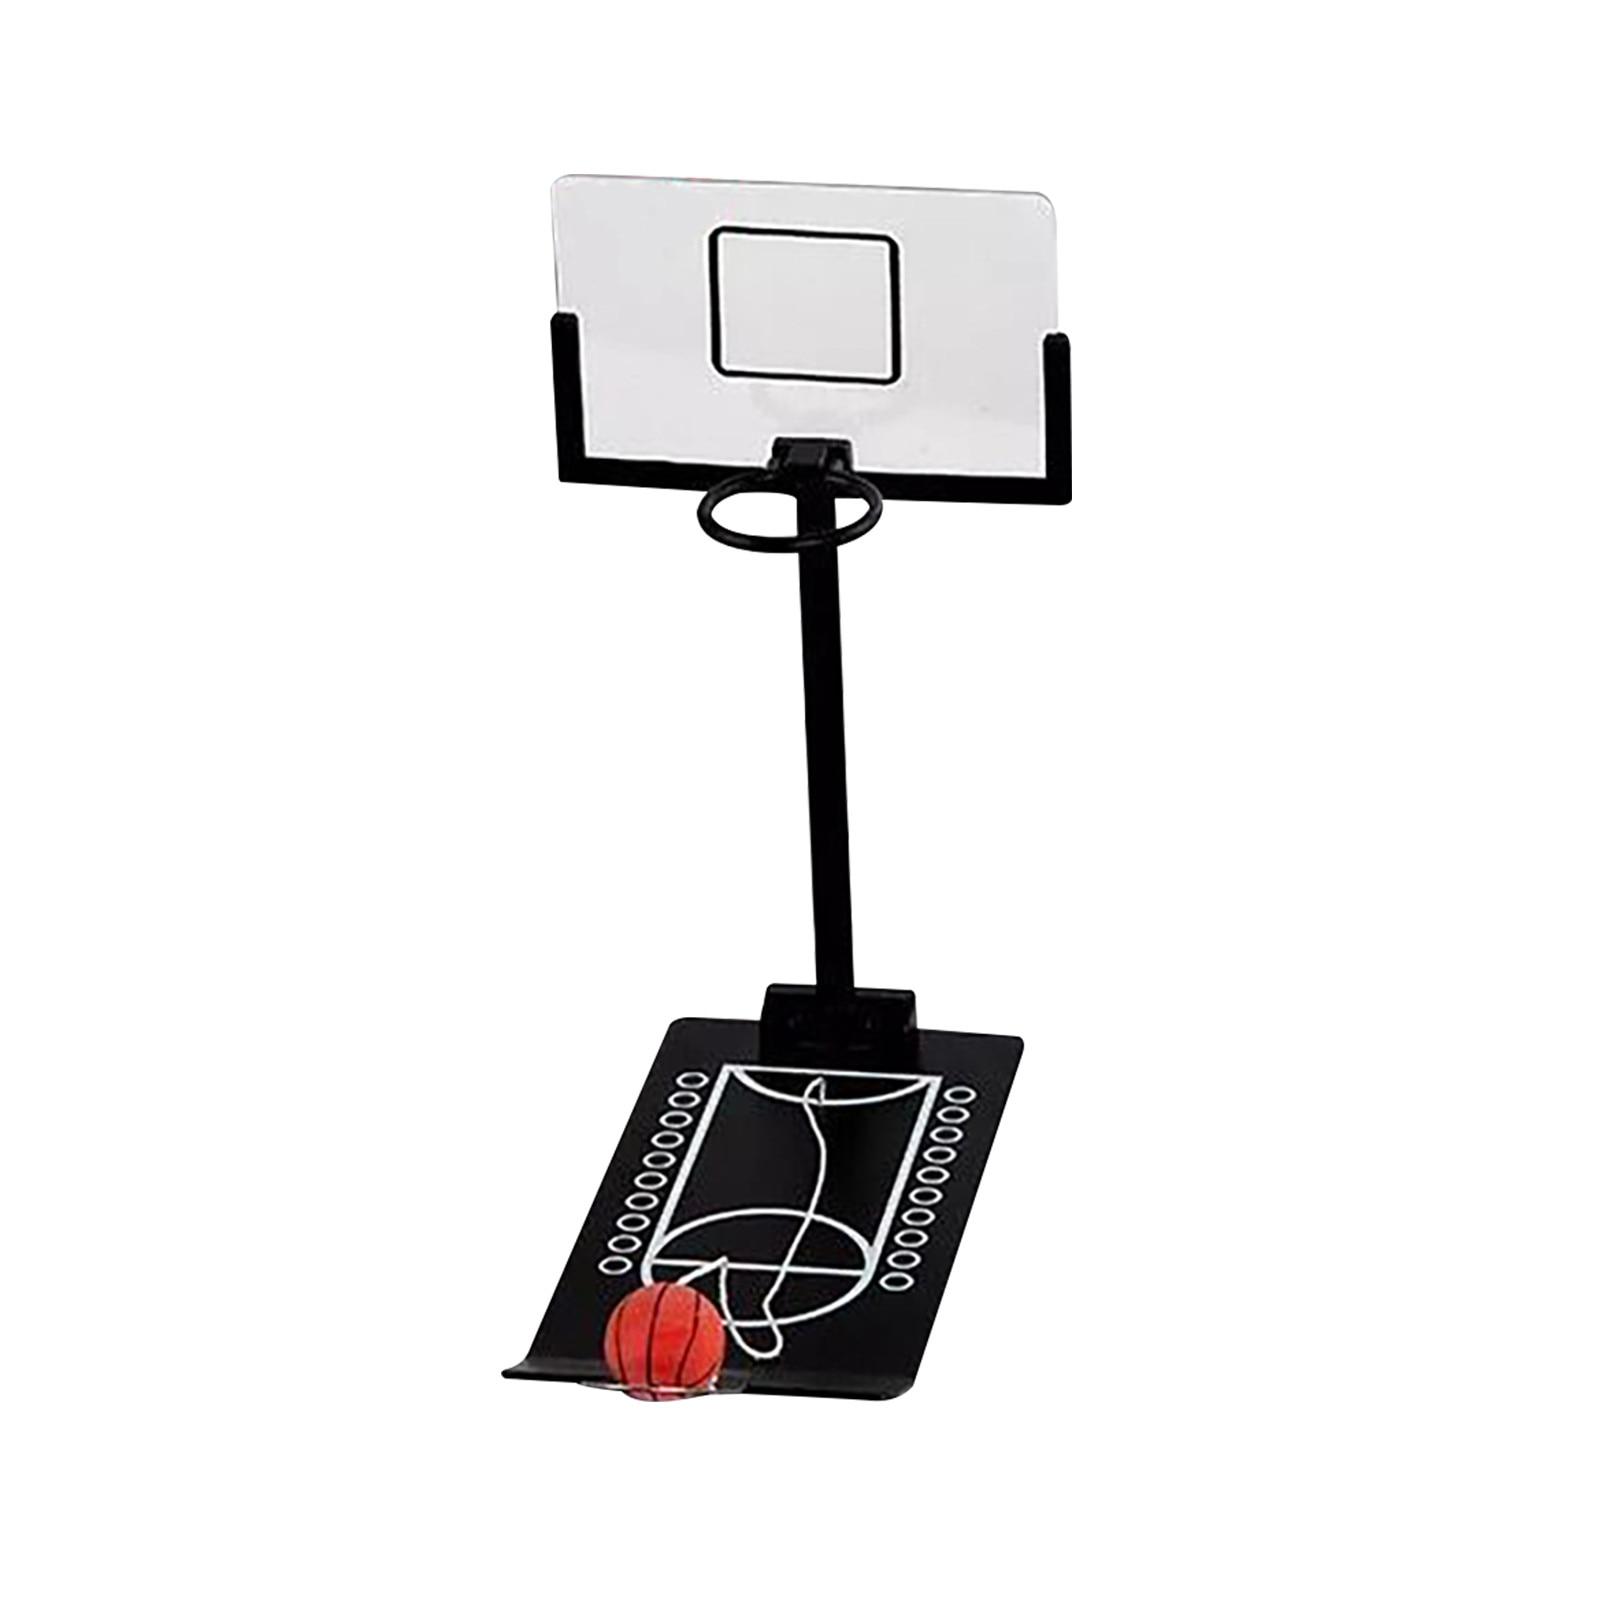 2021 New Fidget Anti Stress Toy Folding Basketball Machine Desktop Basketball Decompression Toy Shooting Stand zabawki antysreso enlarge